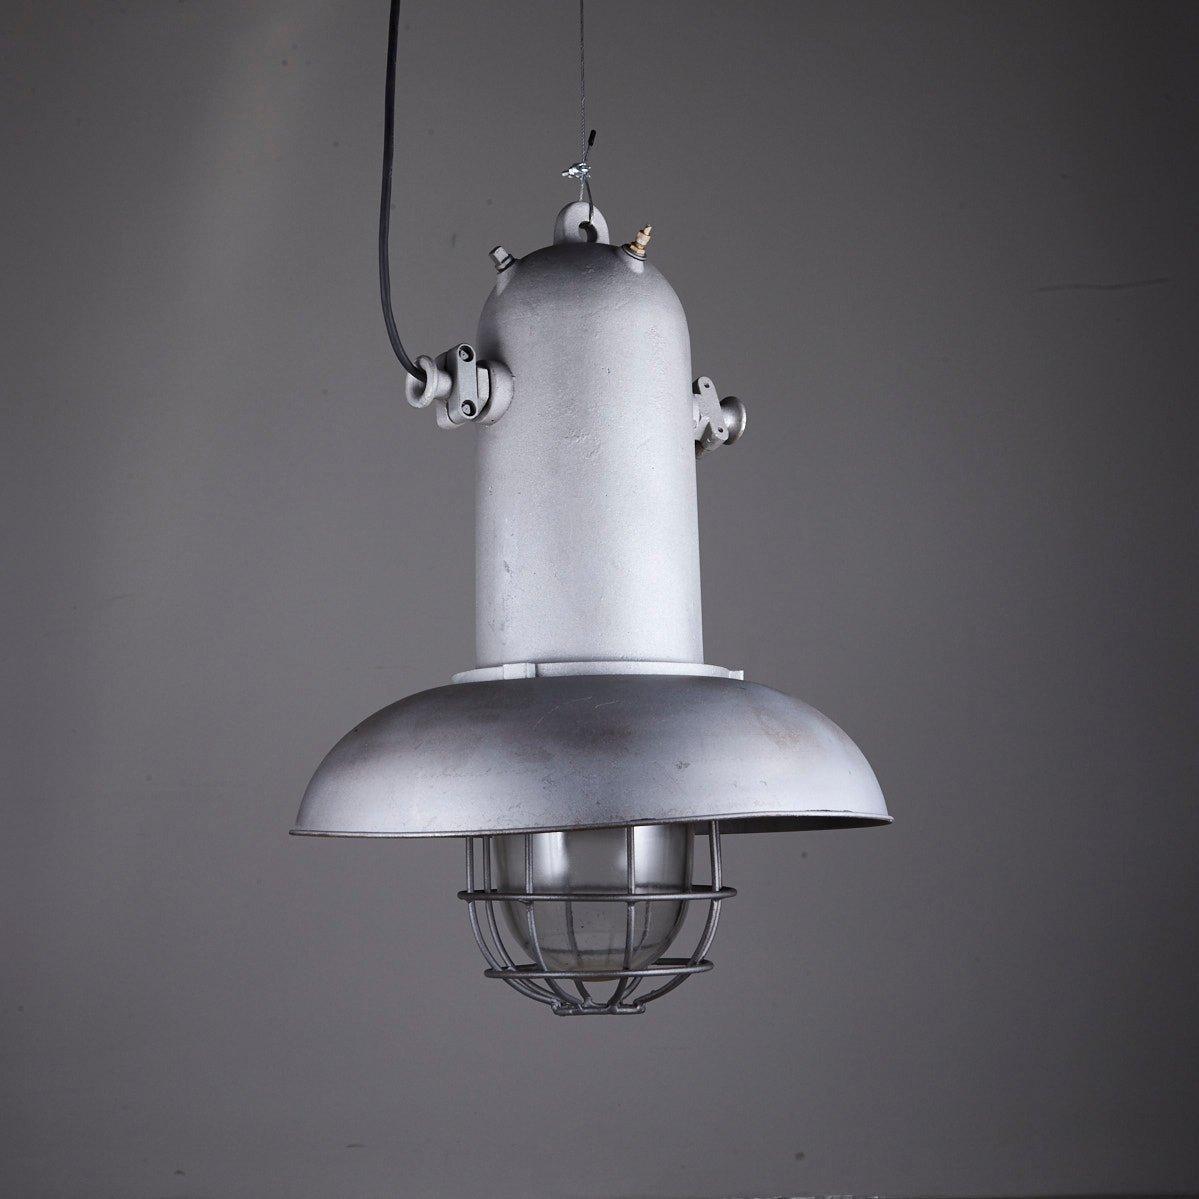 grande suspension industrielle vintage en vente sur pamono. Black Bedroom Furniture Sets. Home Design Ideas